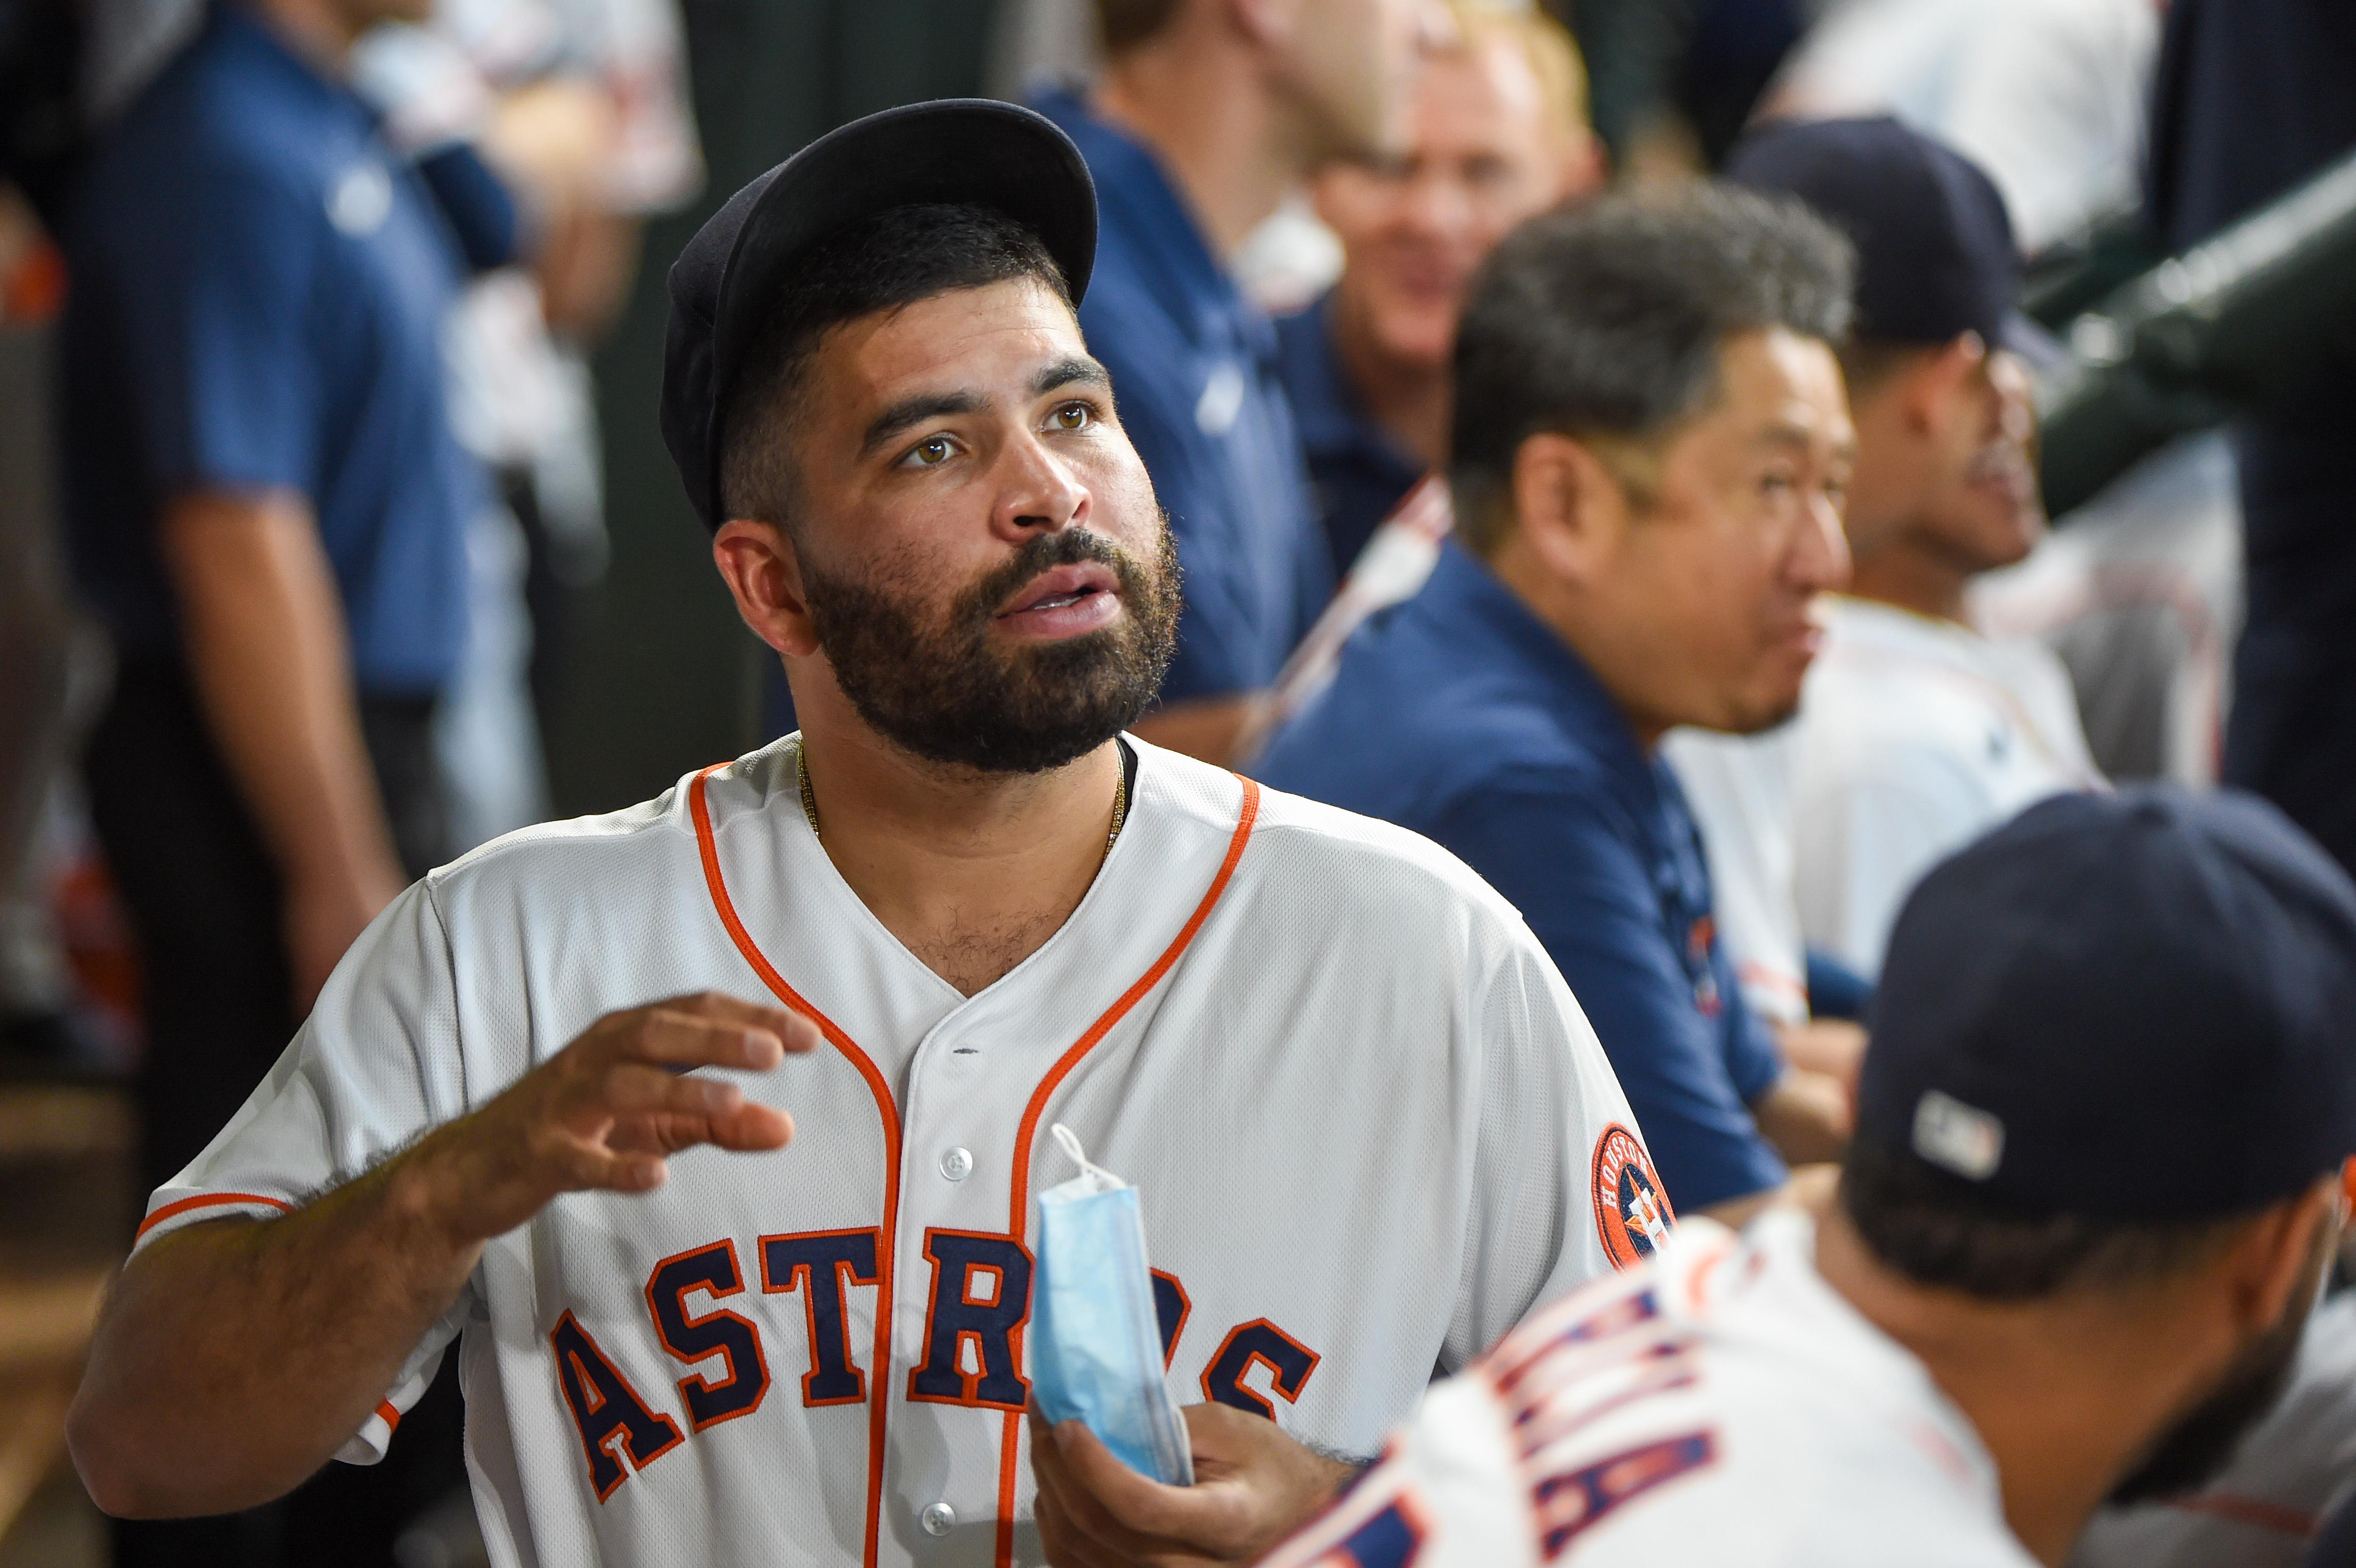 MLB: OCT 07 AL Division Series - White Sox at Astros